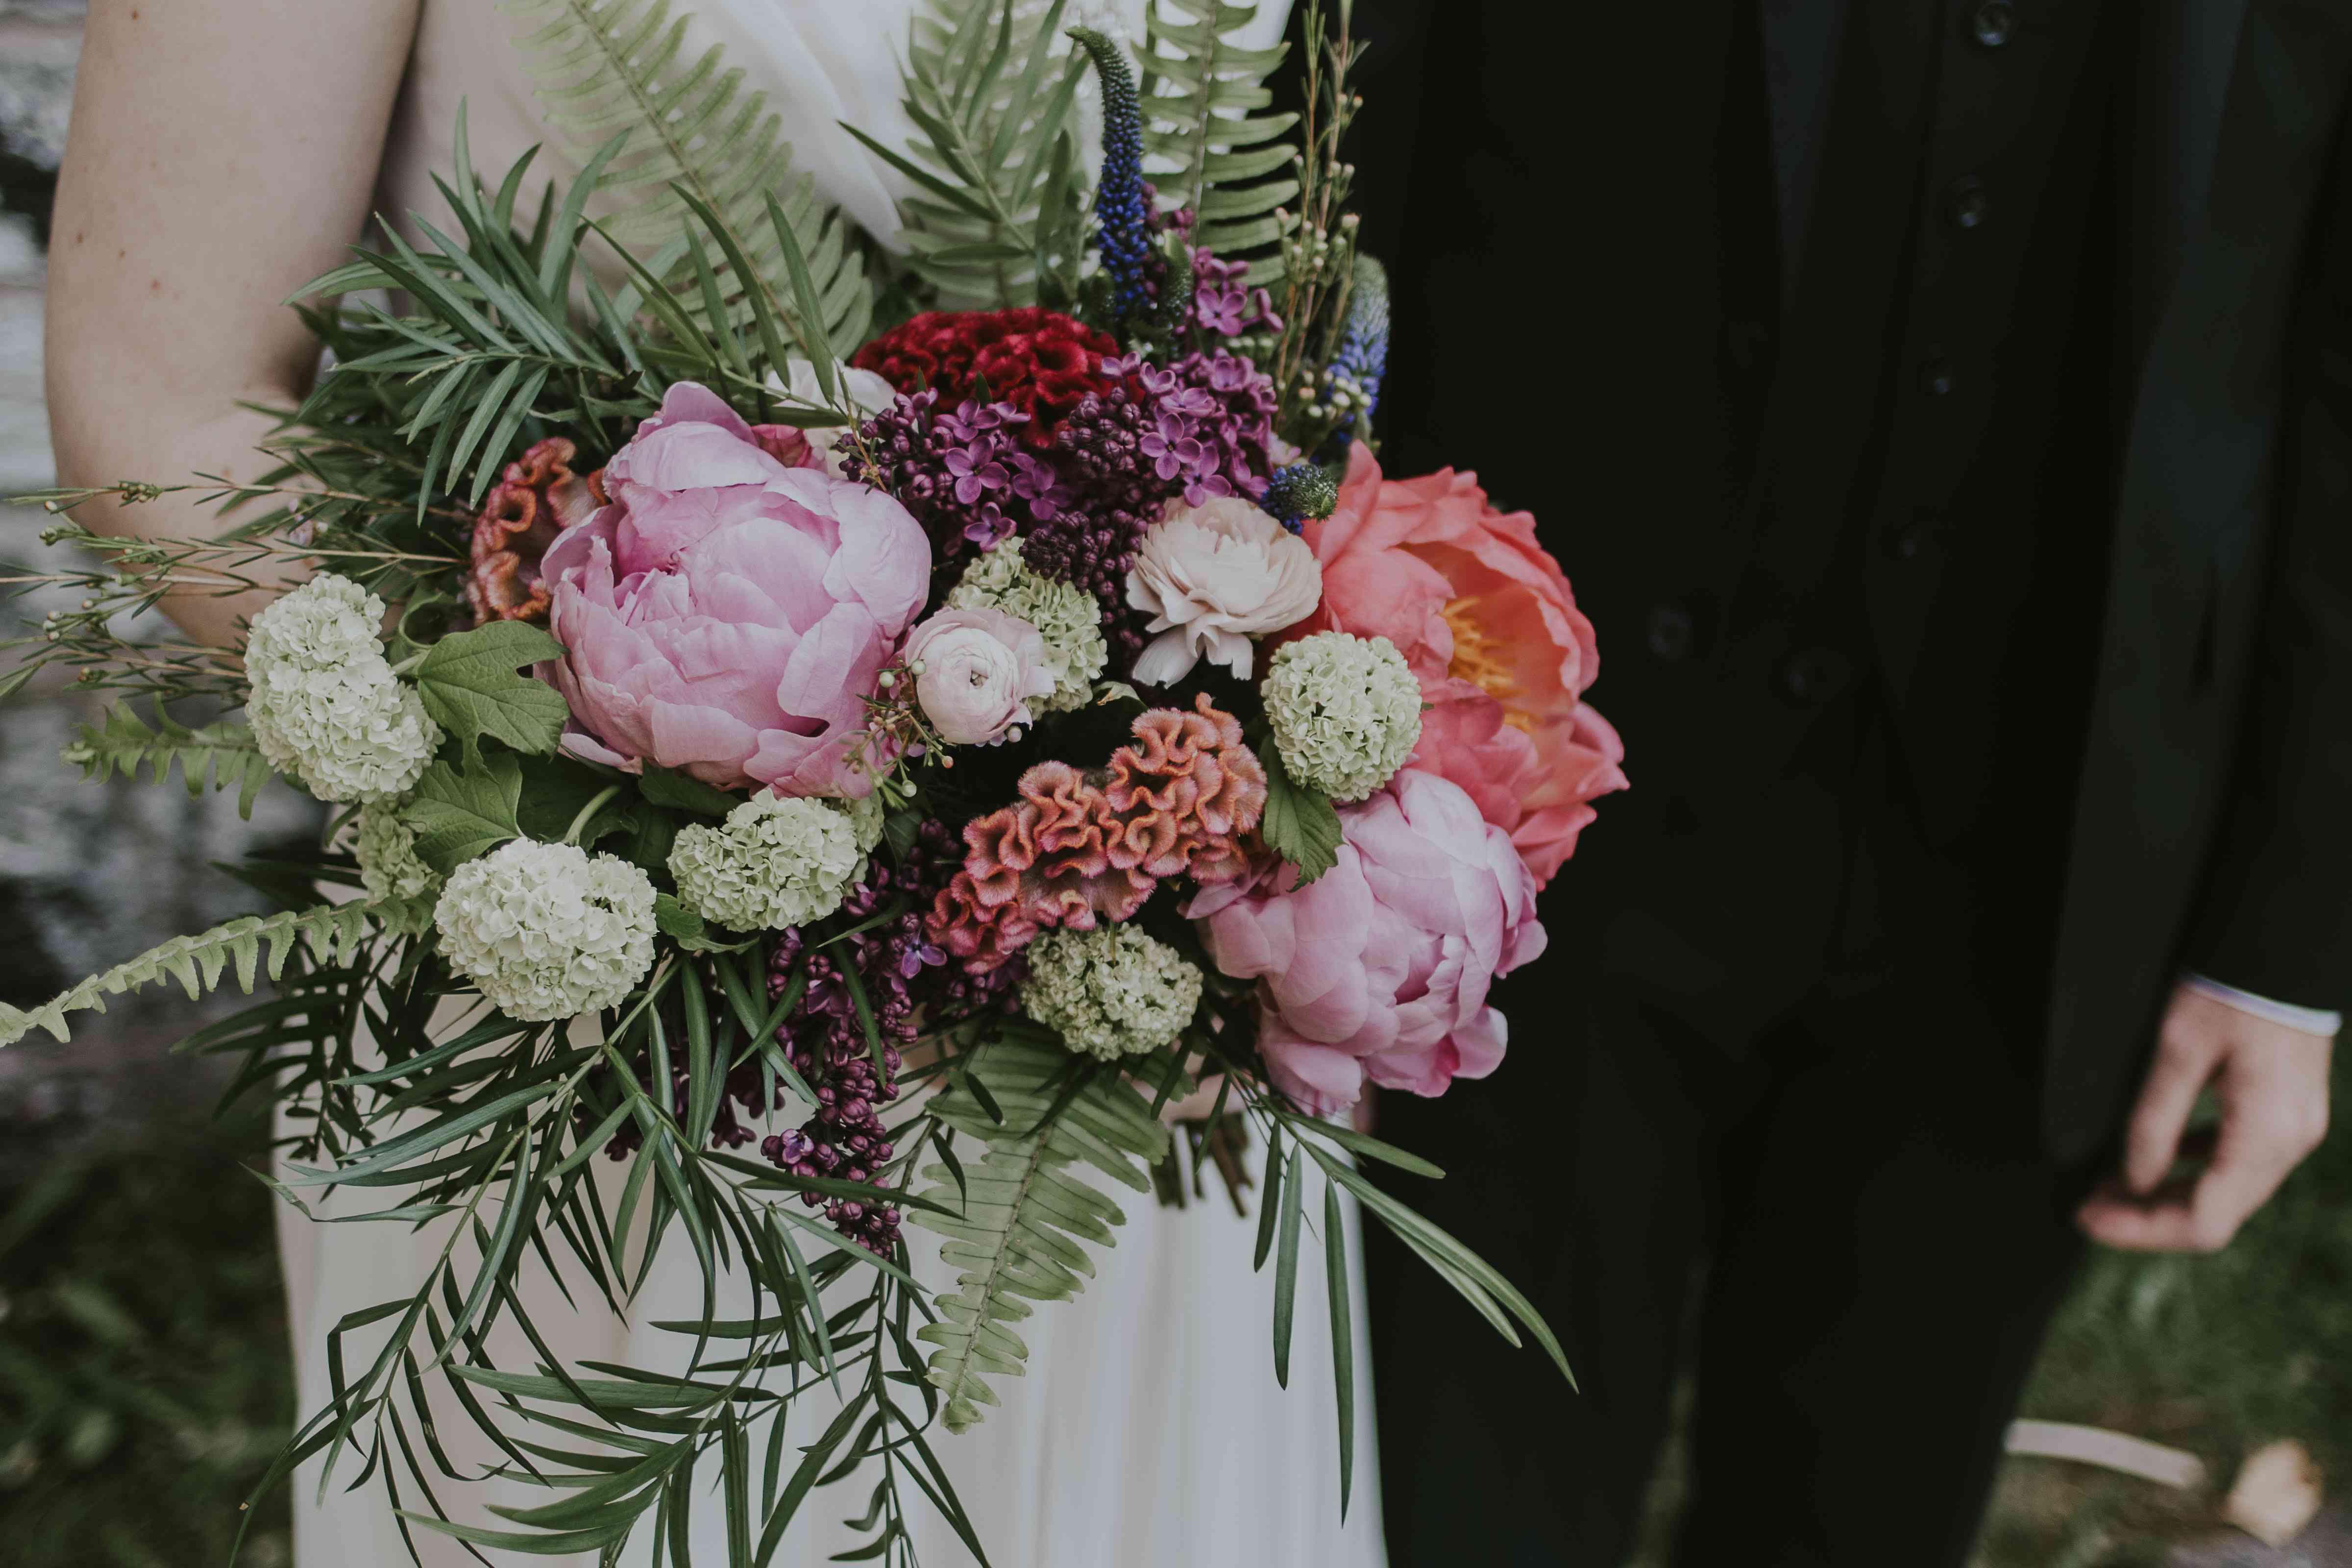 Peony bouquet with wildflowers